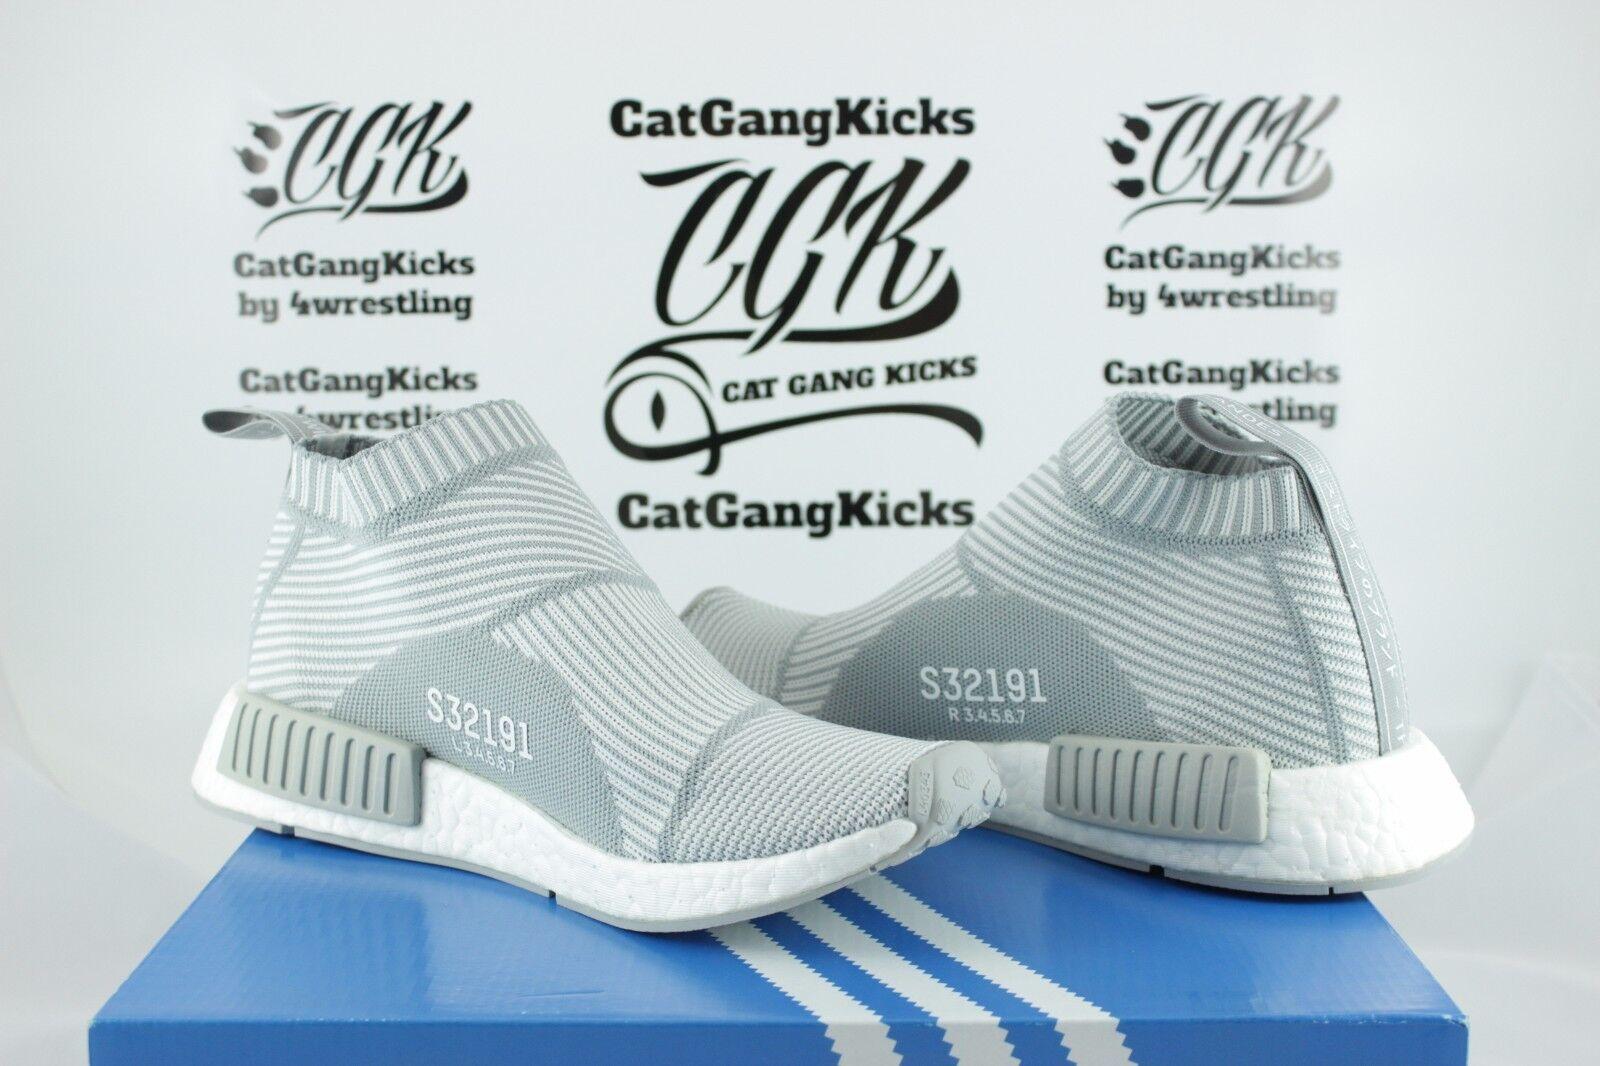 Ds adidas nmd cs1 pk stadt socke primeknit s32191 weißes - licht graue graue sz - weißes 6 3bf53c